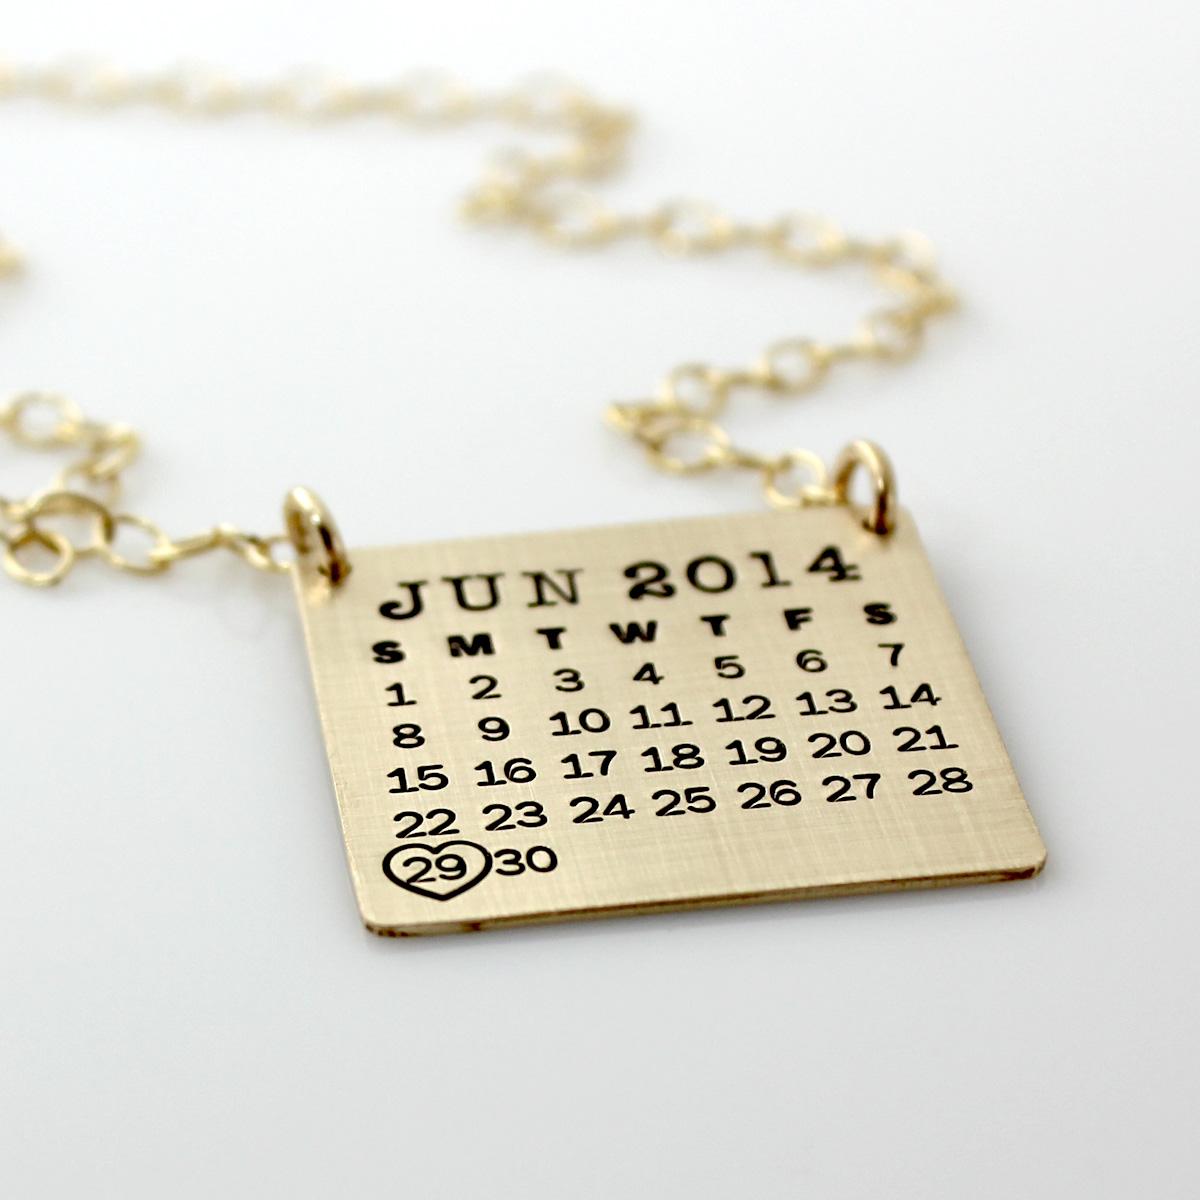 Mark Your Calendar Necklace Top Hang - Gold Filled, Brushed Finish